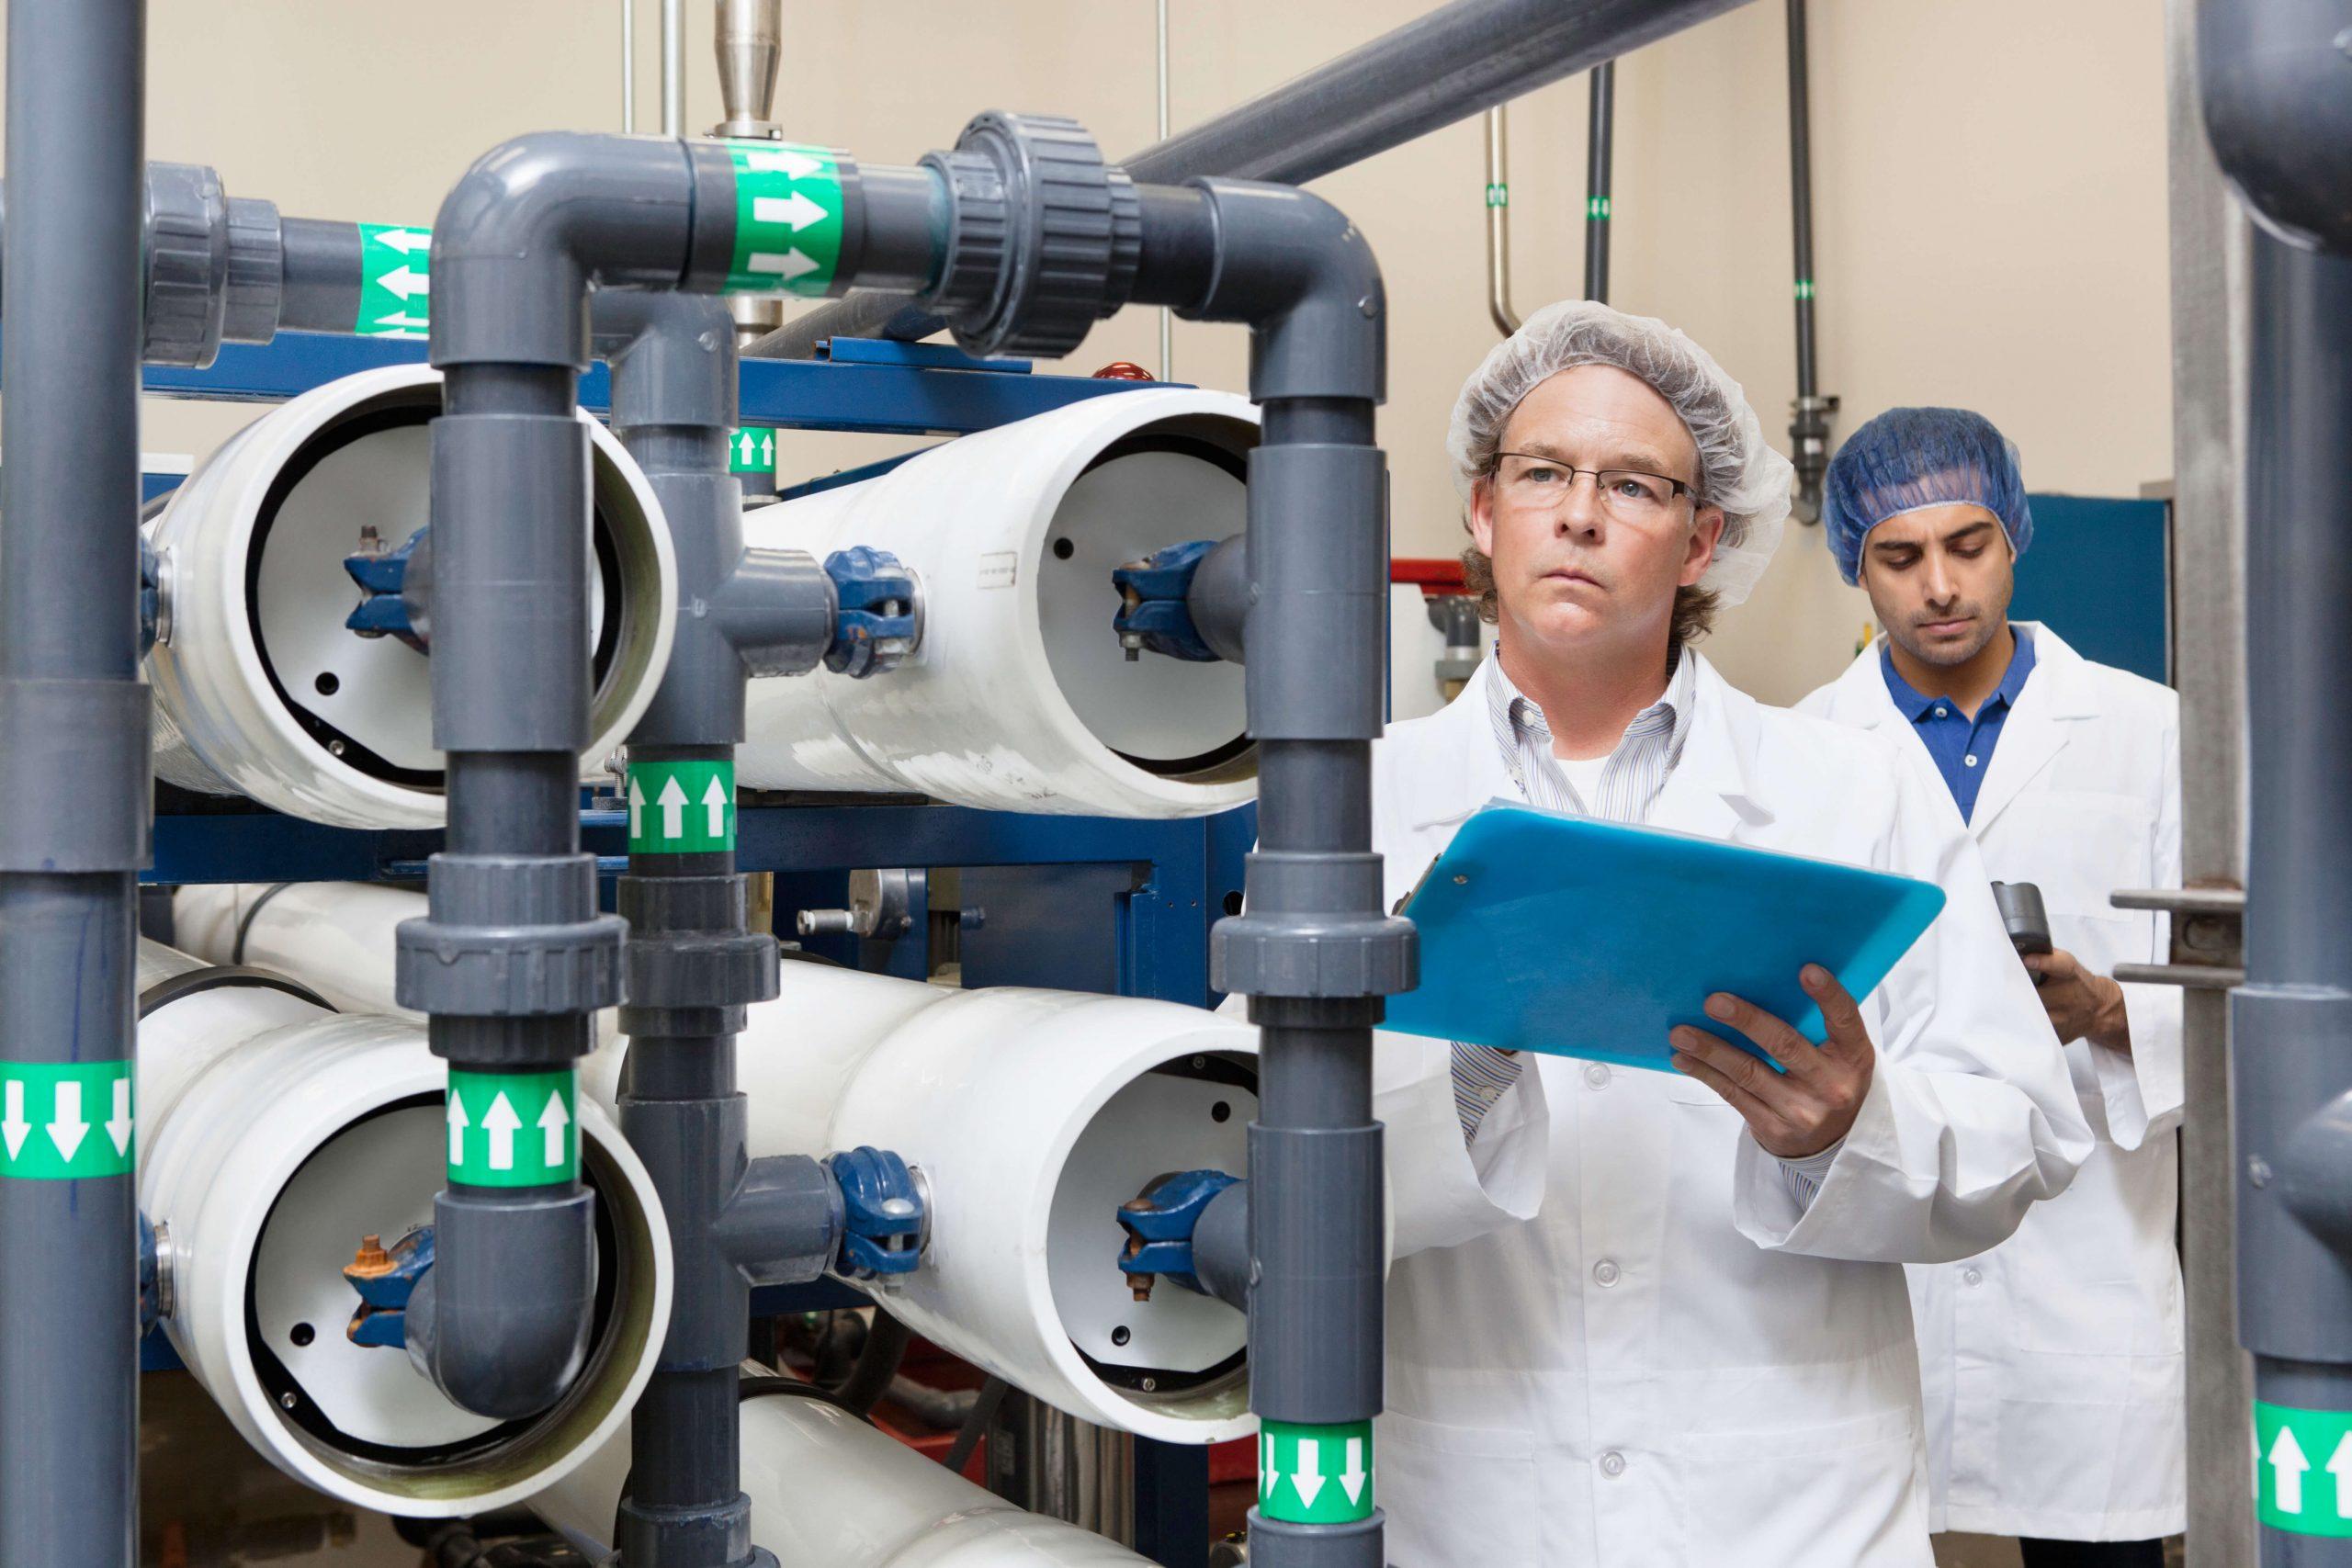 Safety Inspection Hazard communication standard